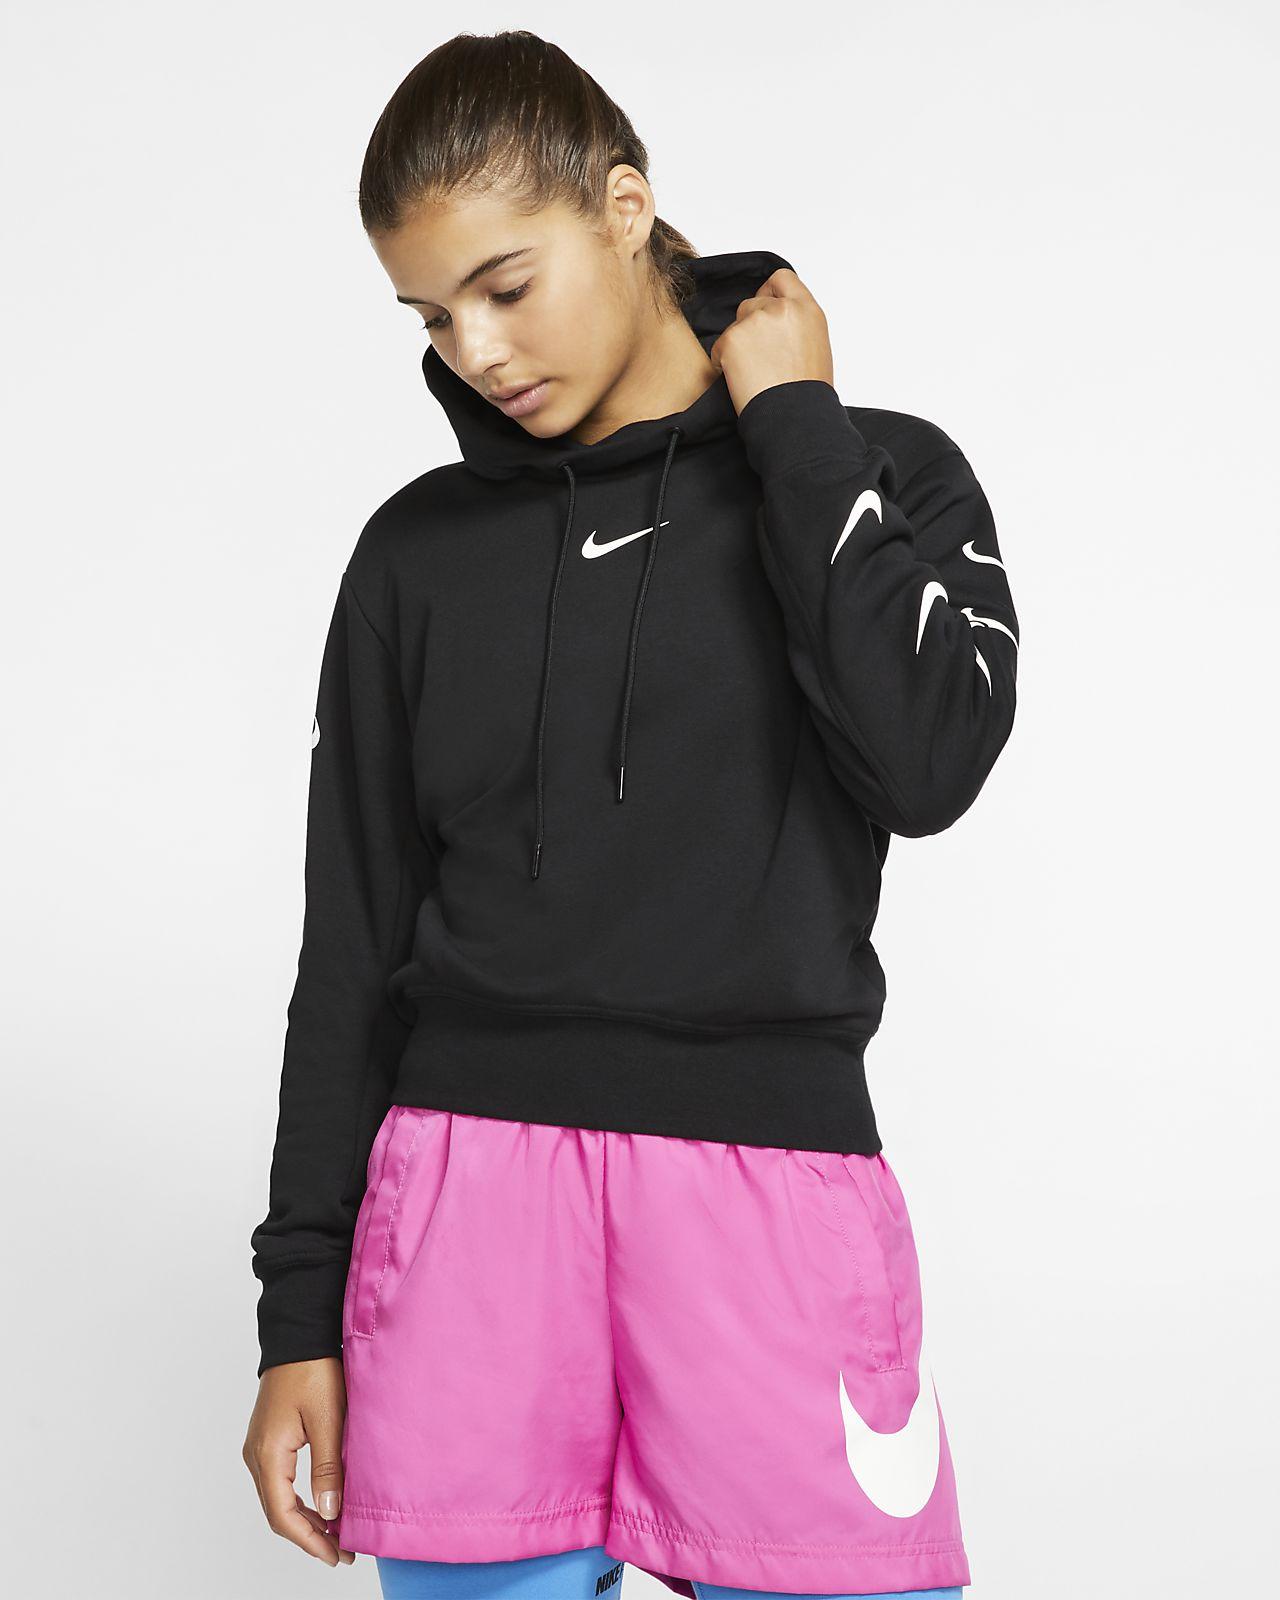 4240ecd6bd00b1 Damska bluza z kapturem Nike Sportswear Swoosh. Nike.com PL